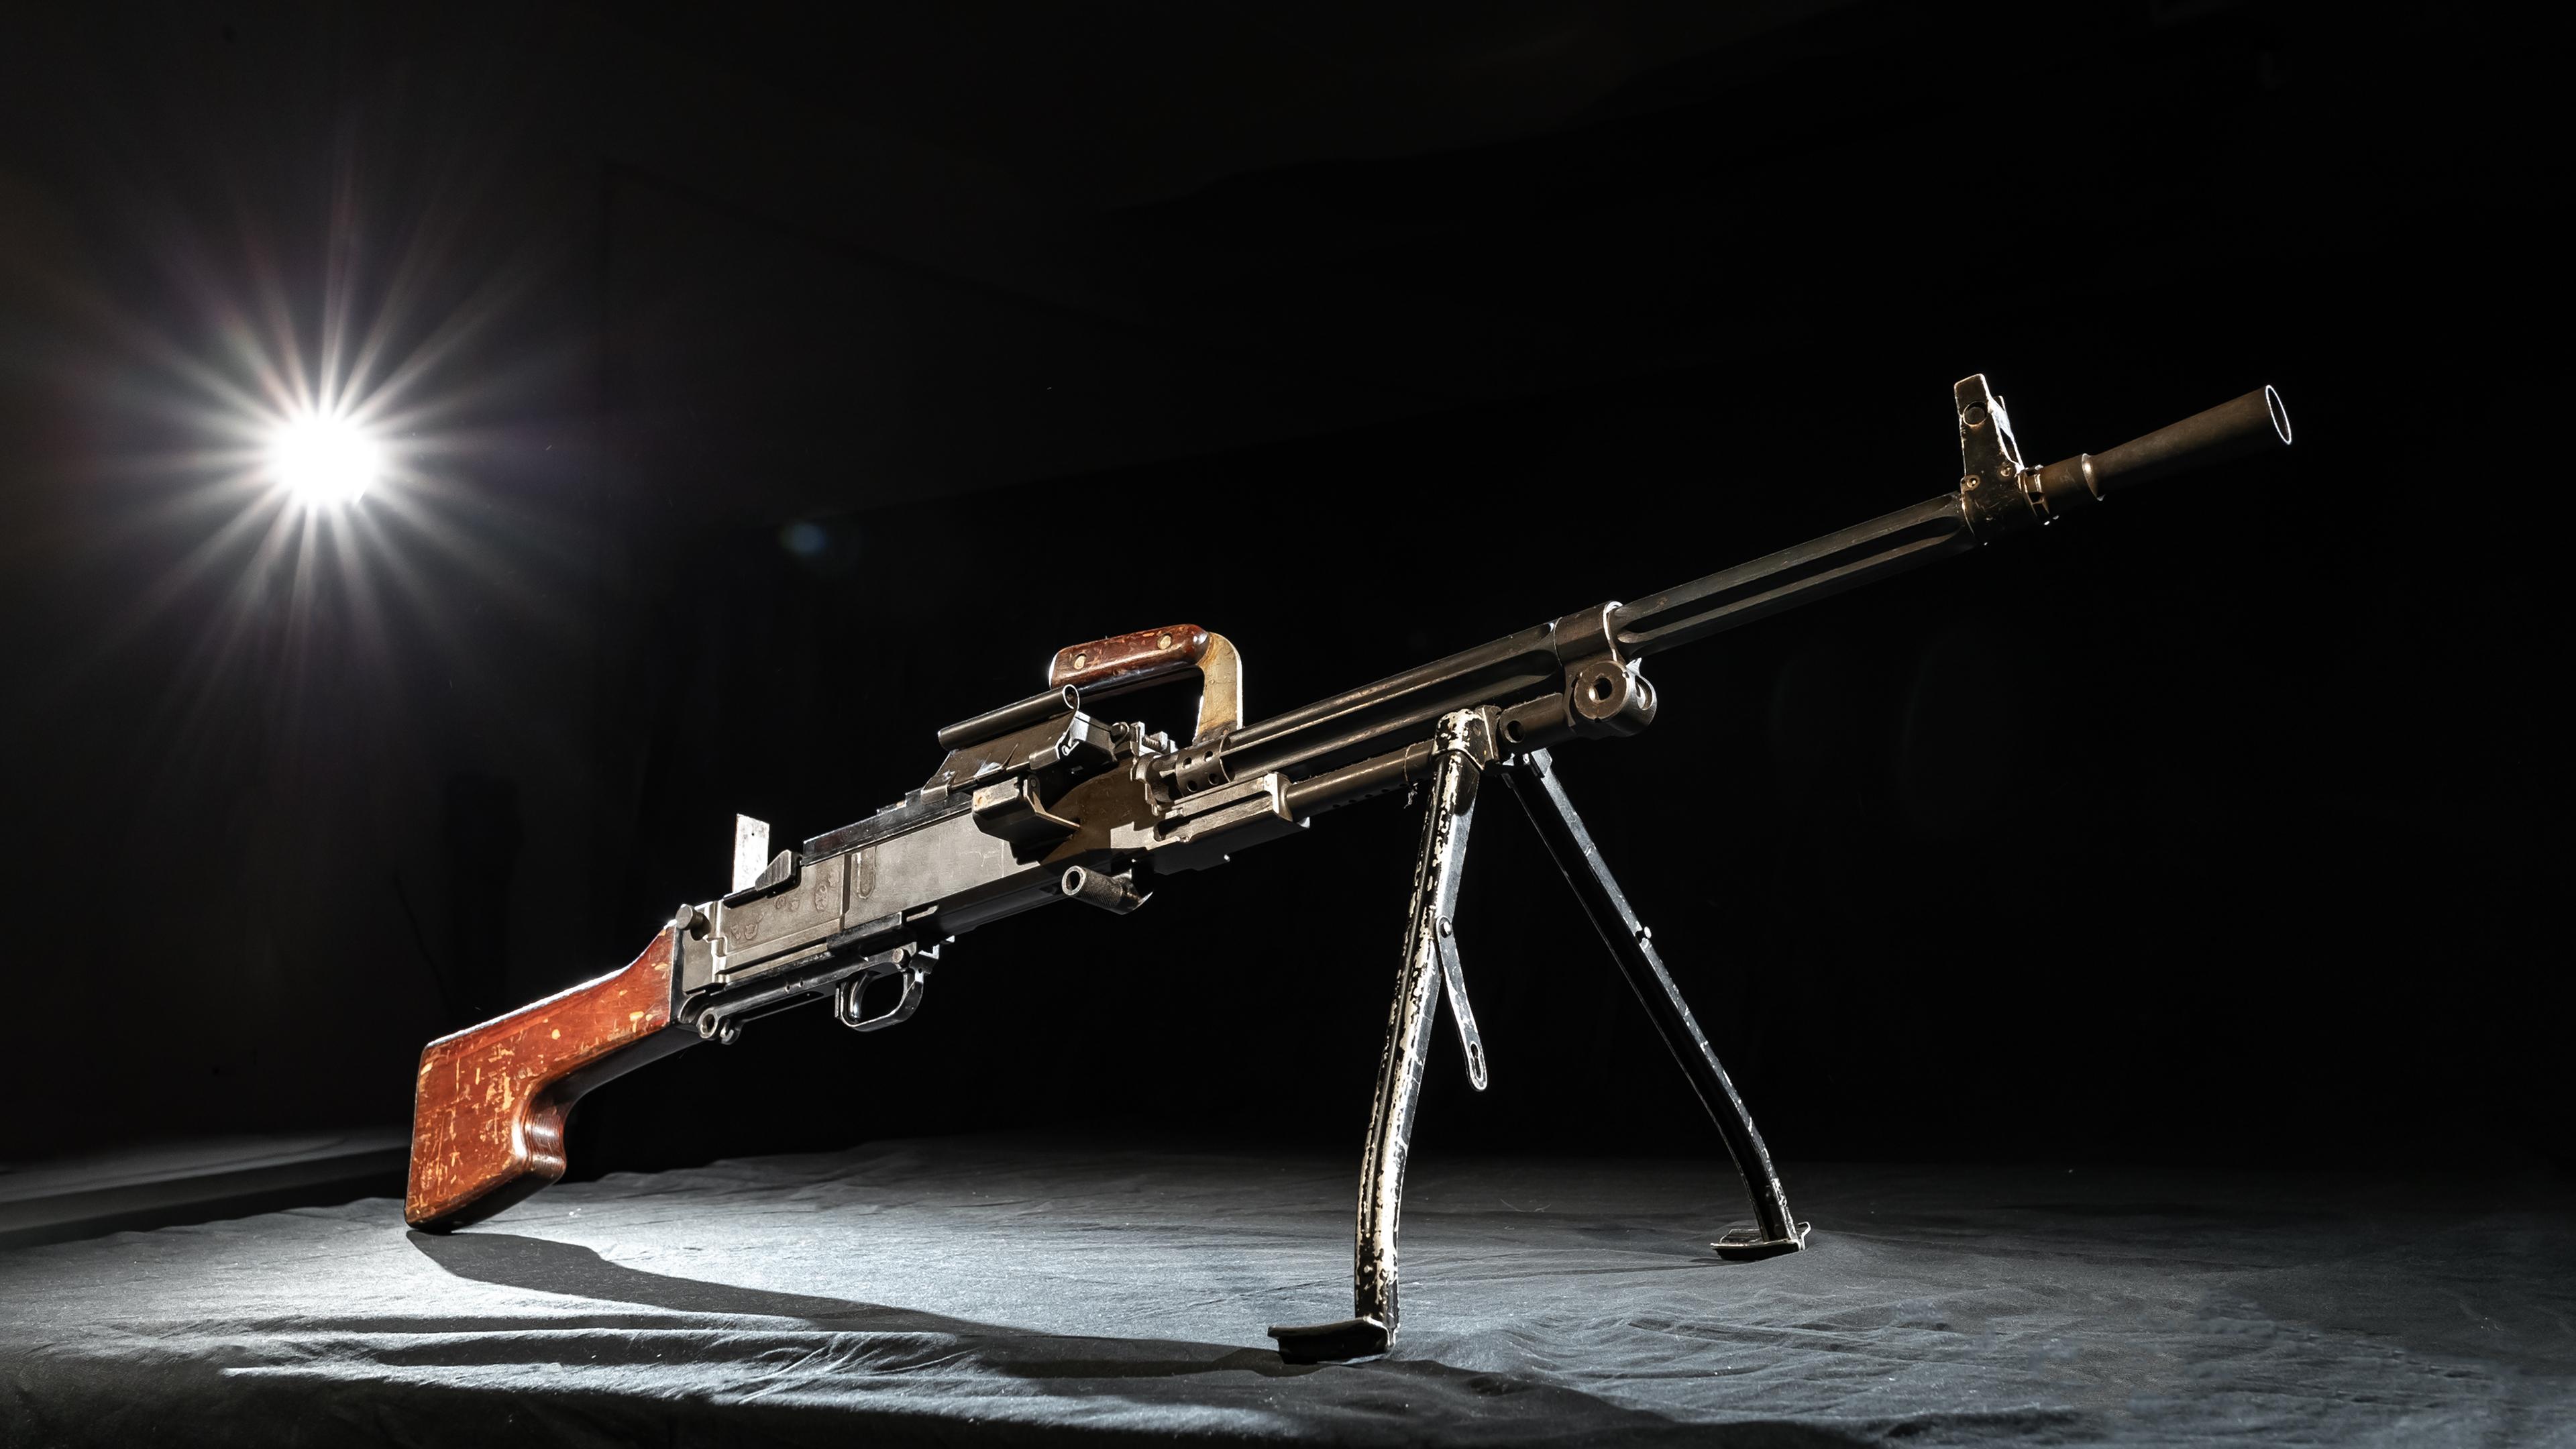 Паноптикум: ТКБ-464 Силина-Перерушева | Kalashnikov.Media